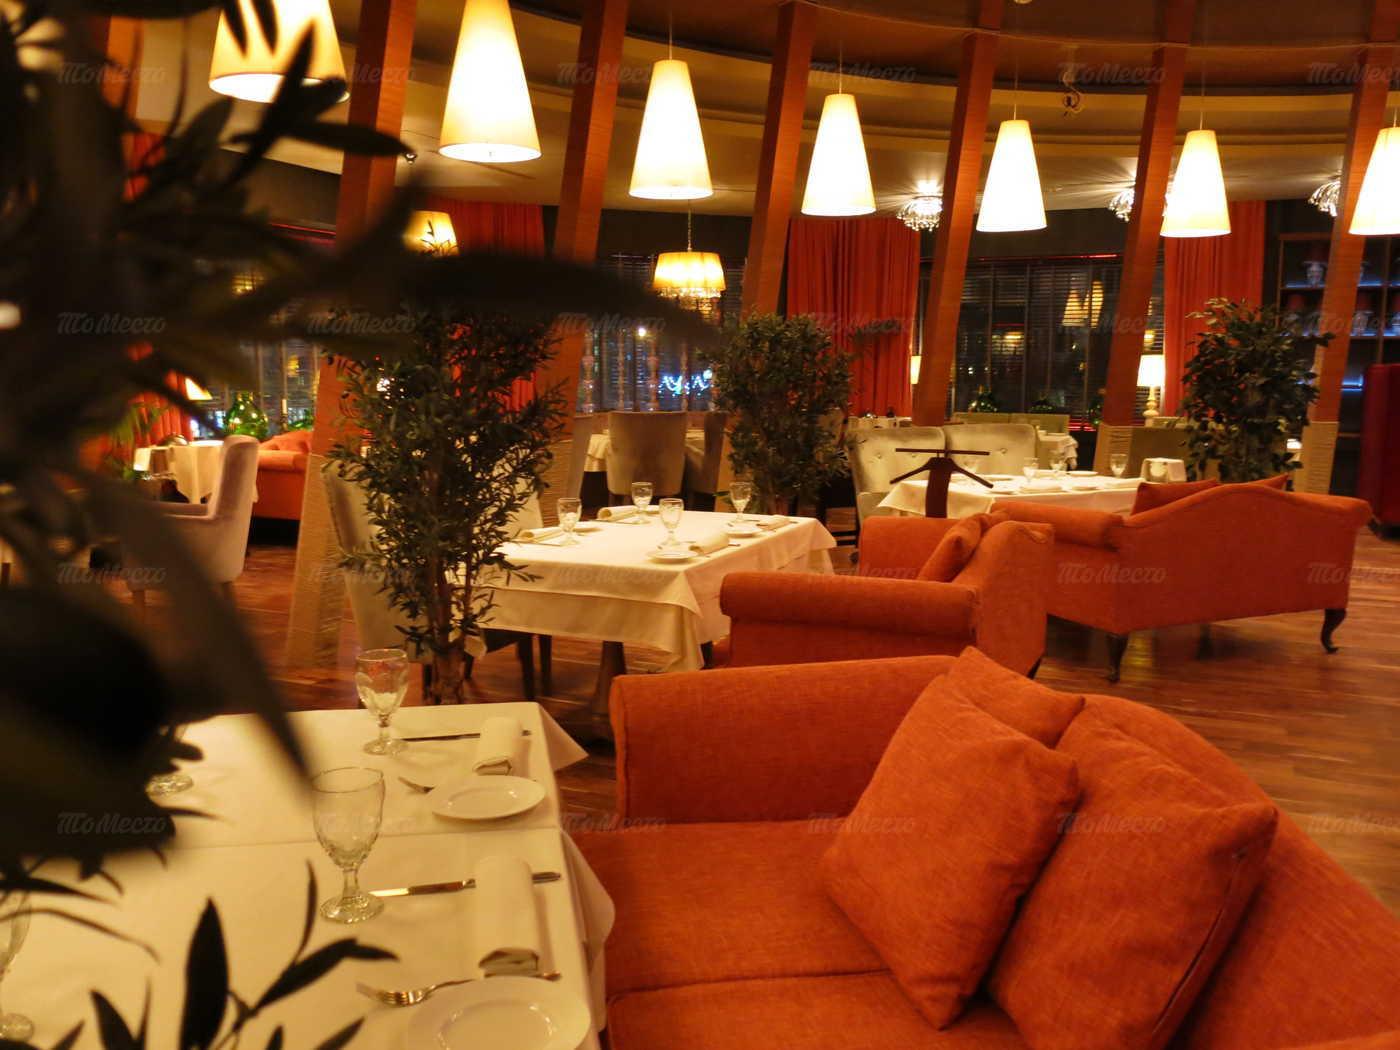 Меню бара, ресторана Чайка (Chaika) на Марксистской улице